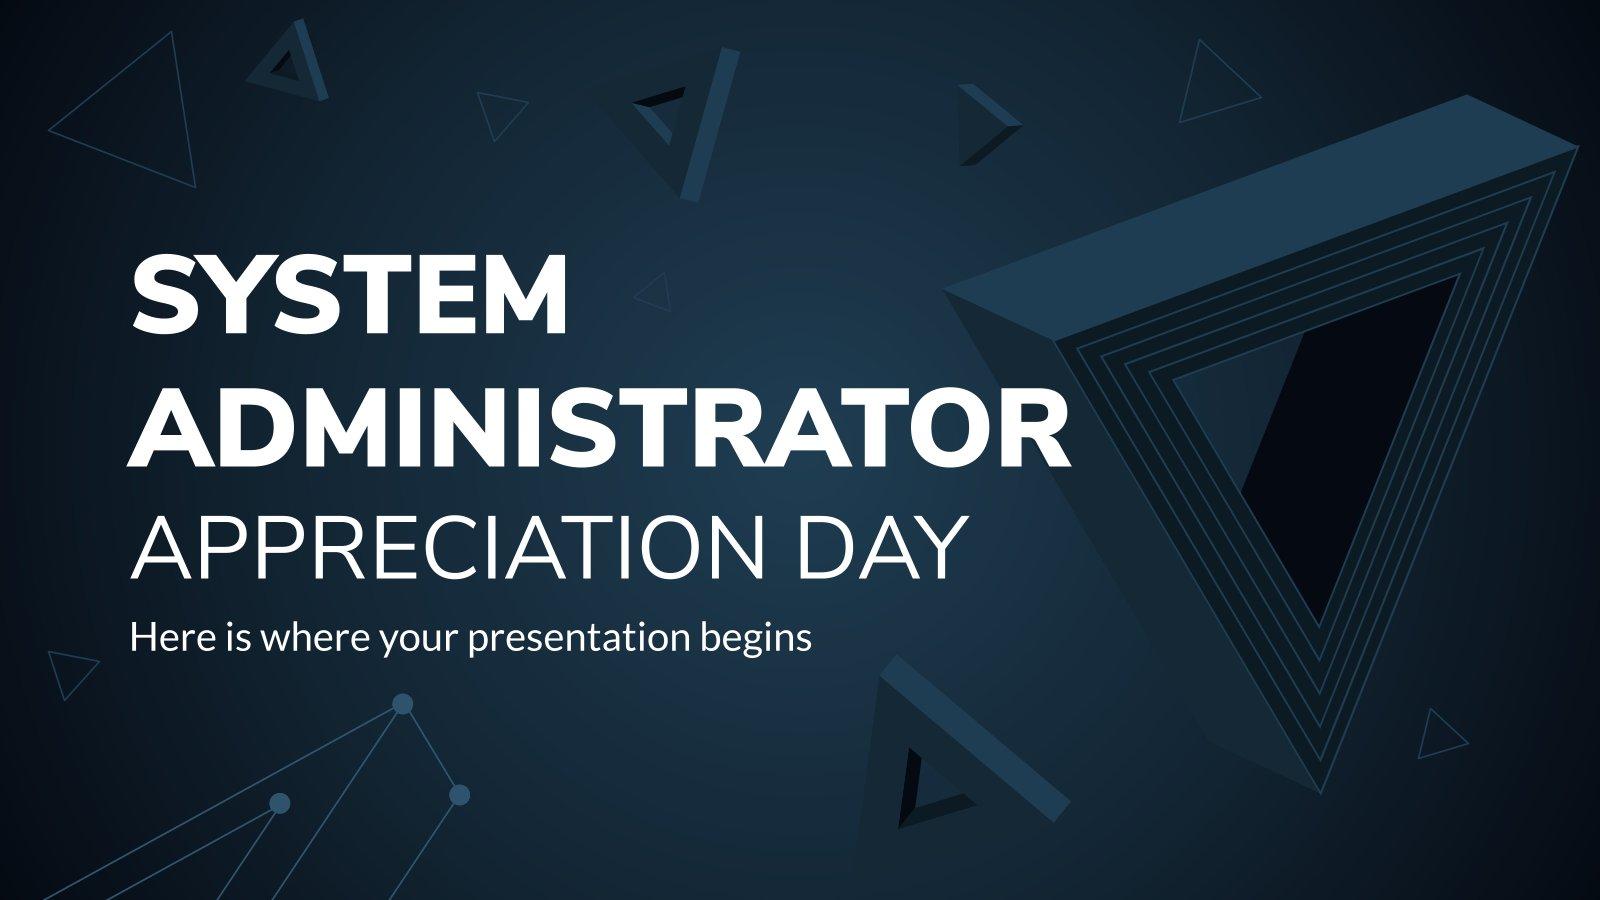 System Administrator Appreciation Day presentation template